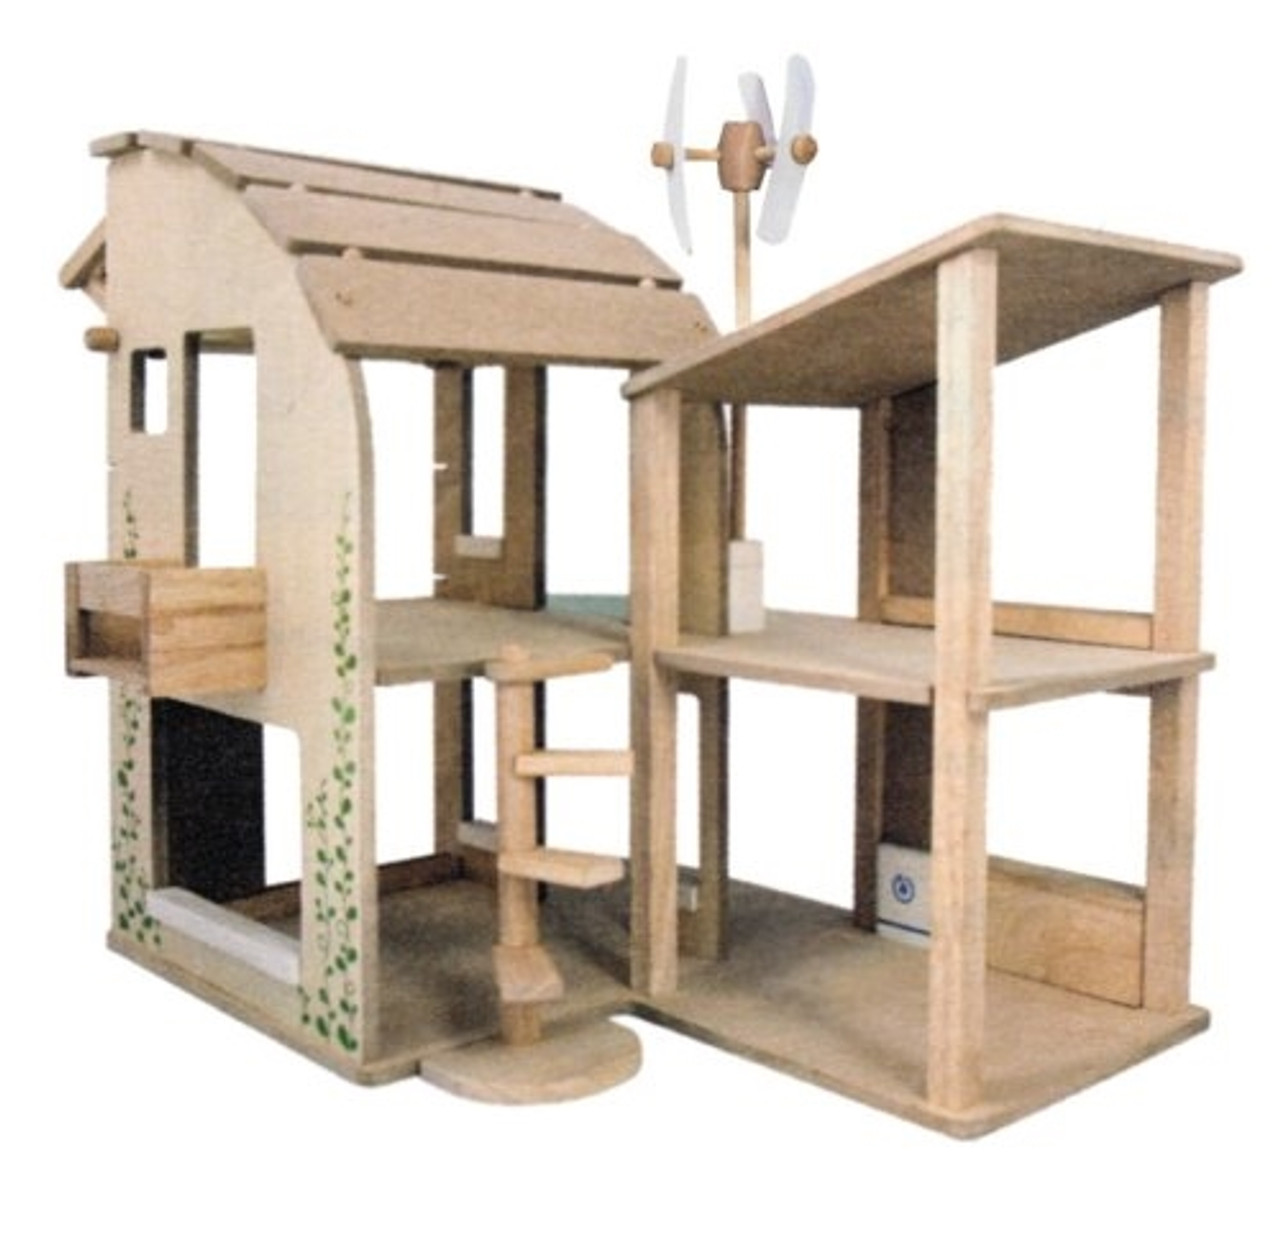 Wooden Dollhouse - Eco-Design